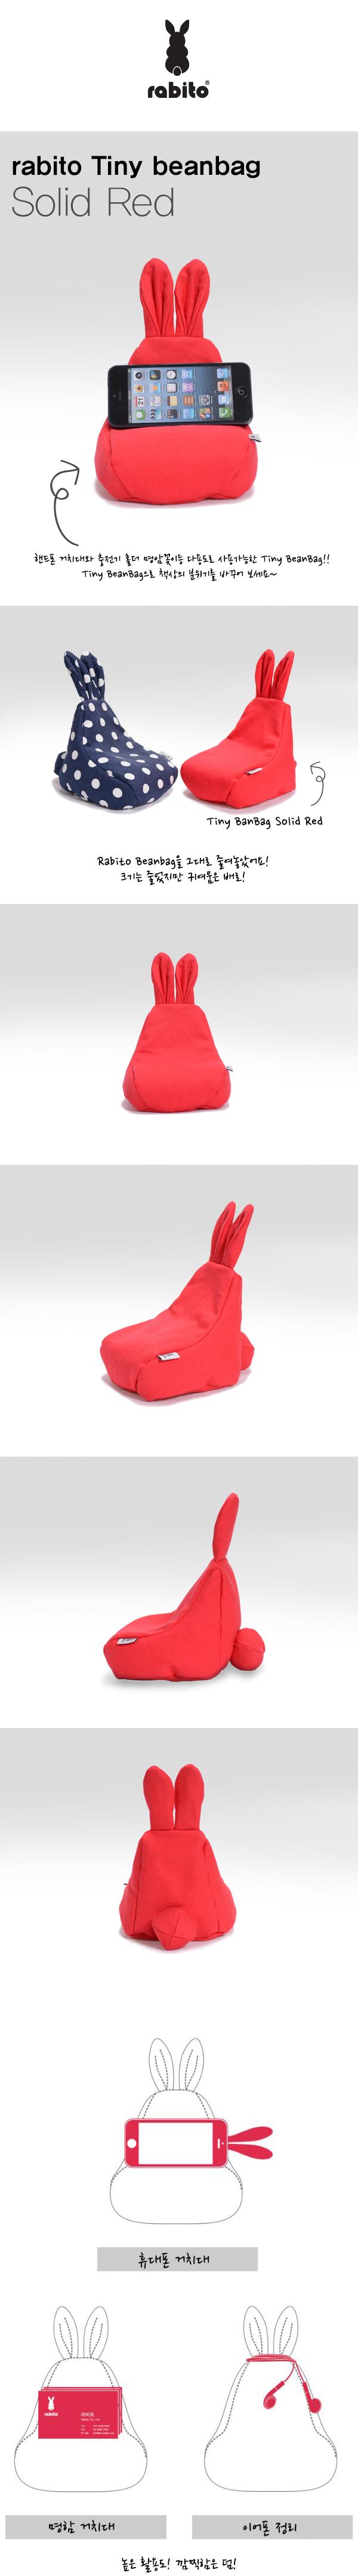 tiny beanbag(solid red) - 라비또, 14,700원, 데스크정리, 파티션/선반